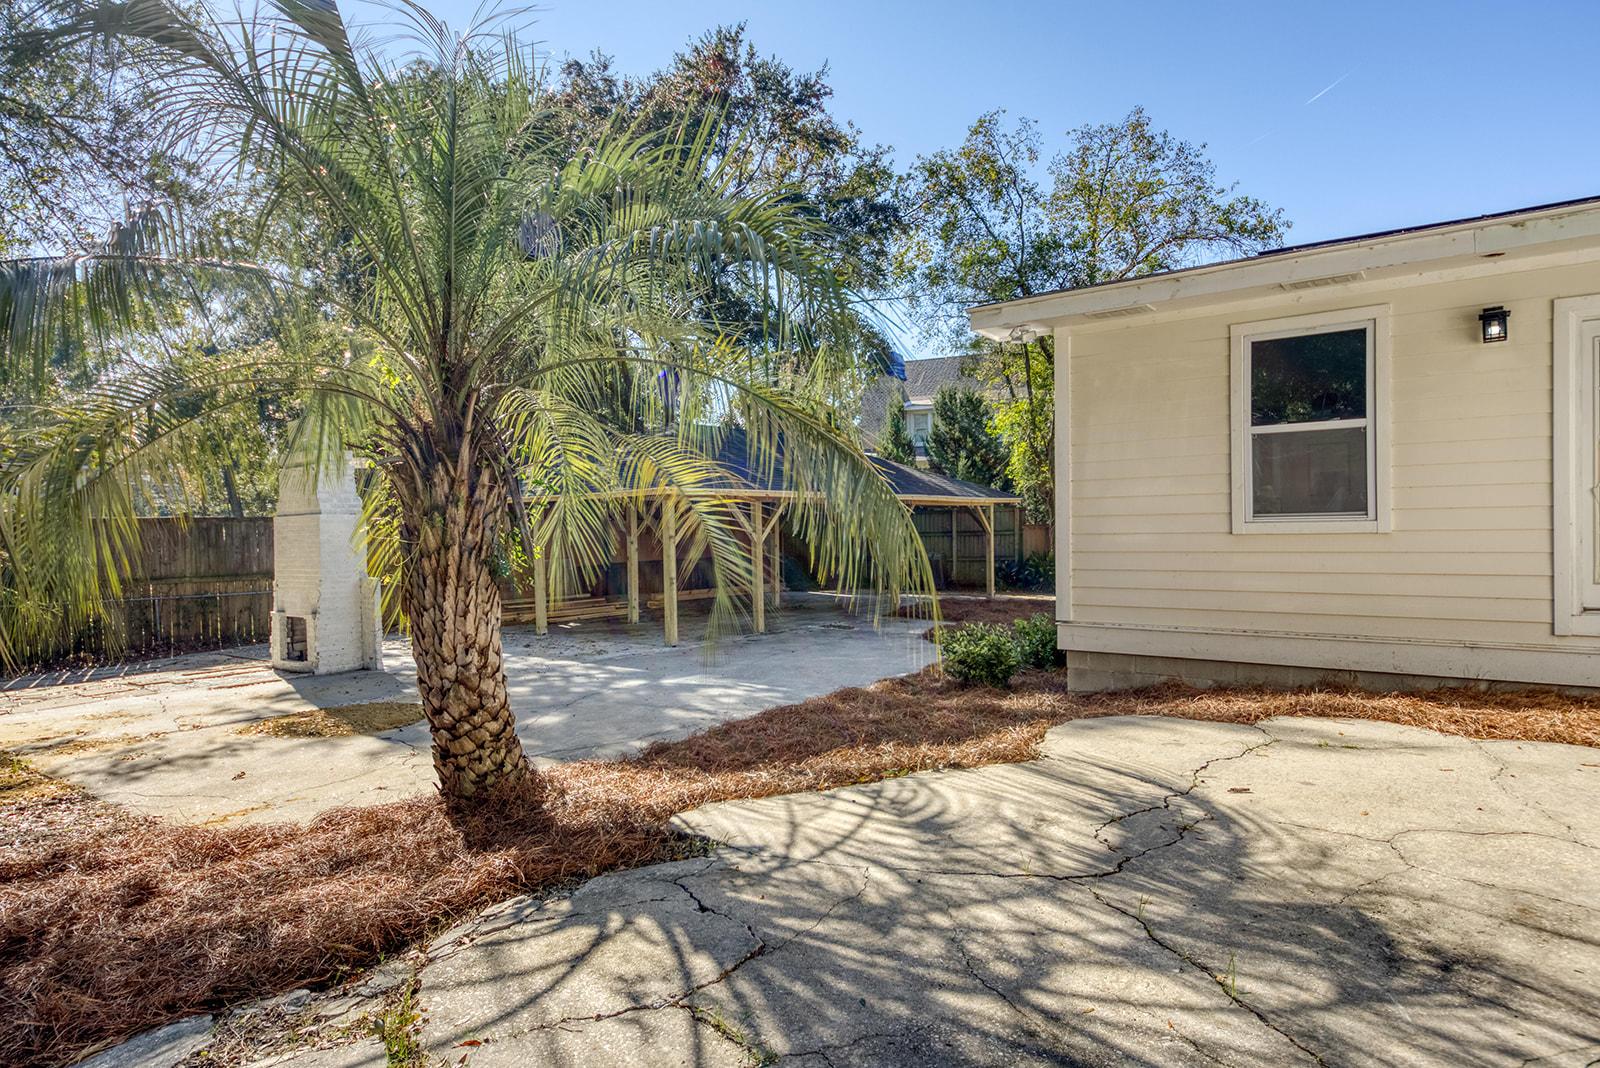 Bay View Acres Homes For Sale - 265 Coleman, Mount Pleasant, SC - 56